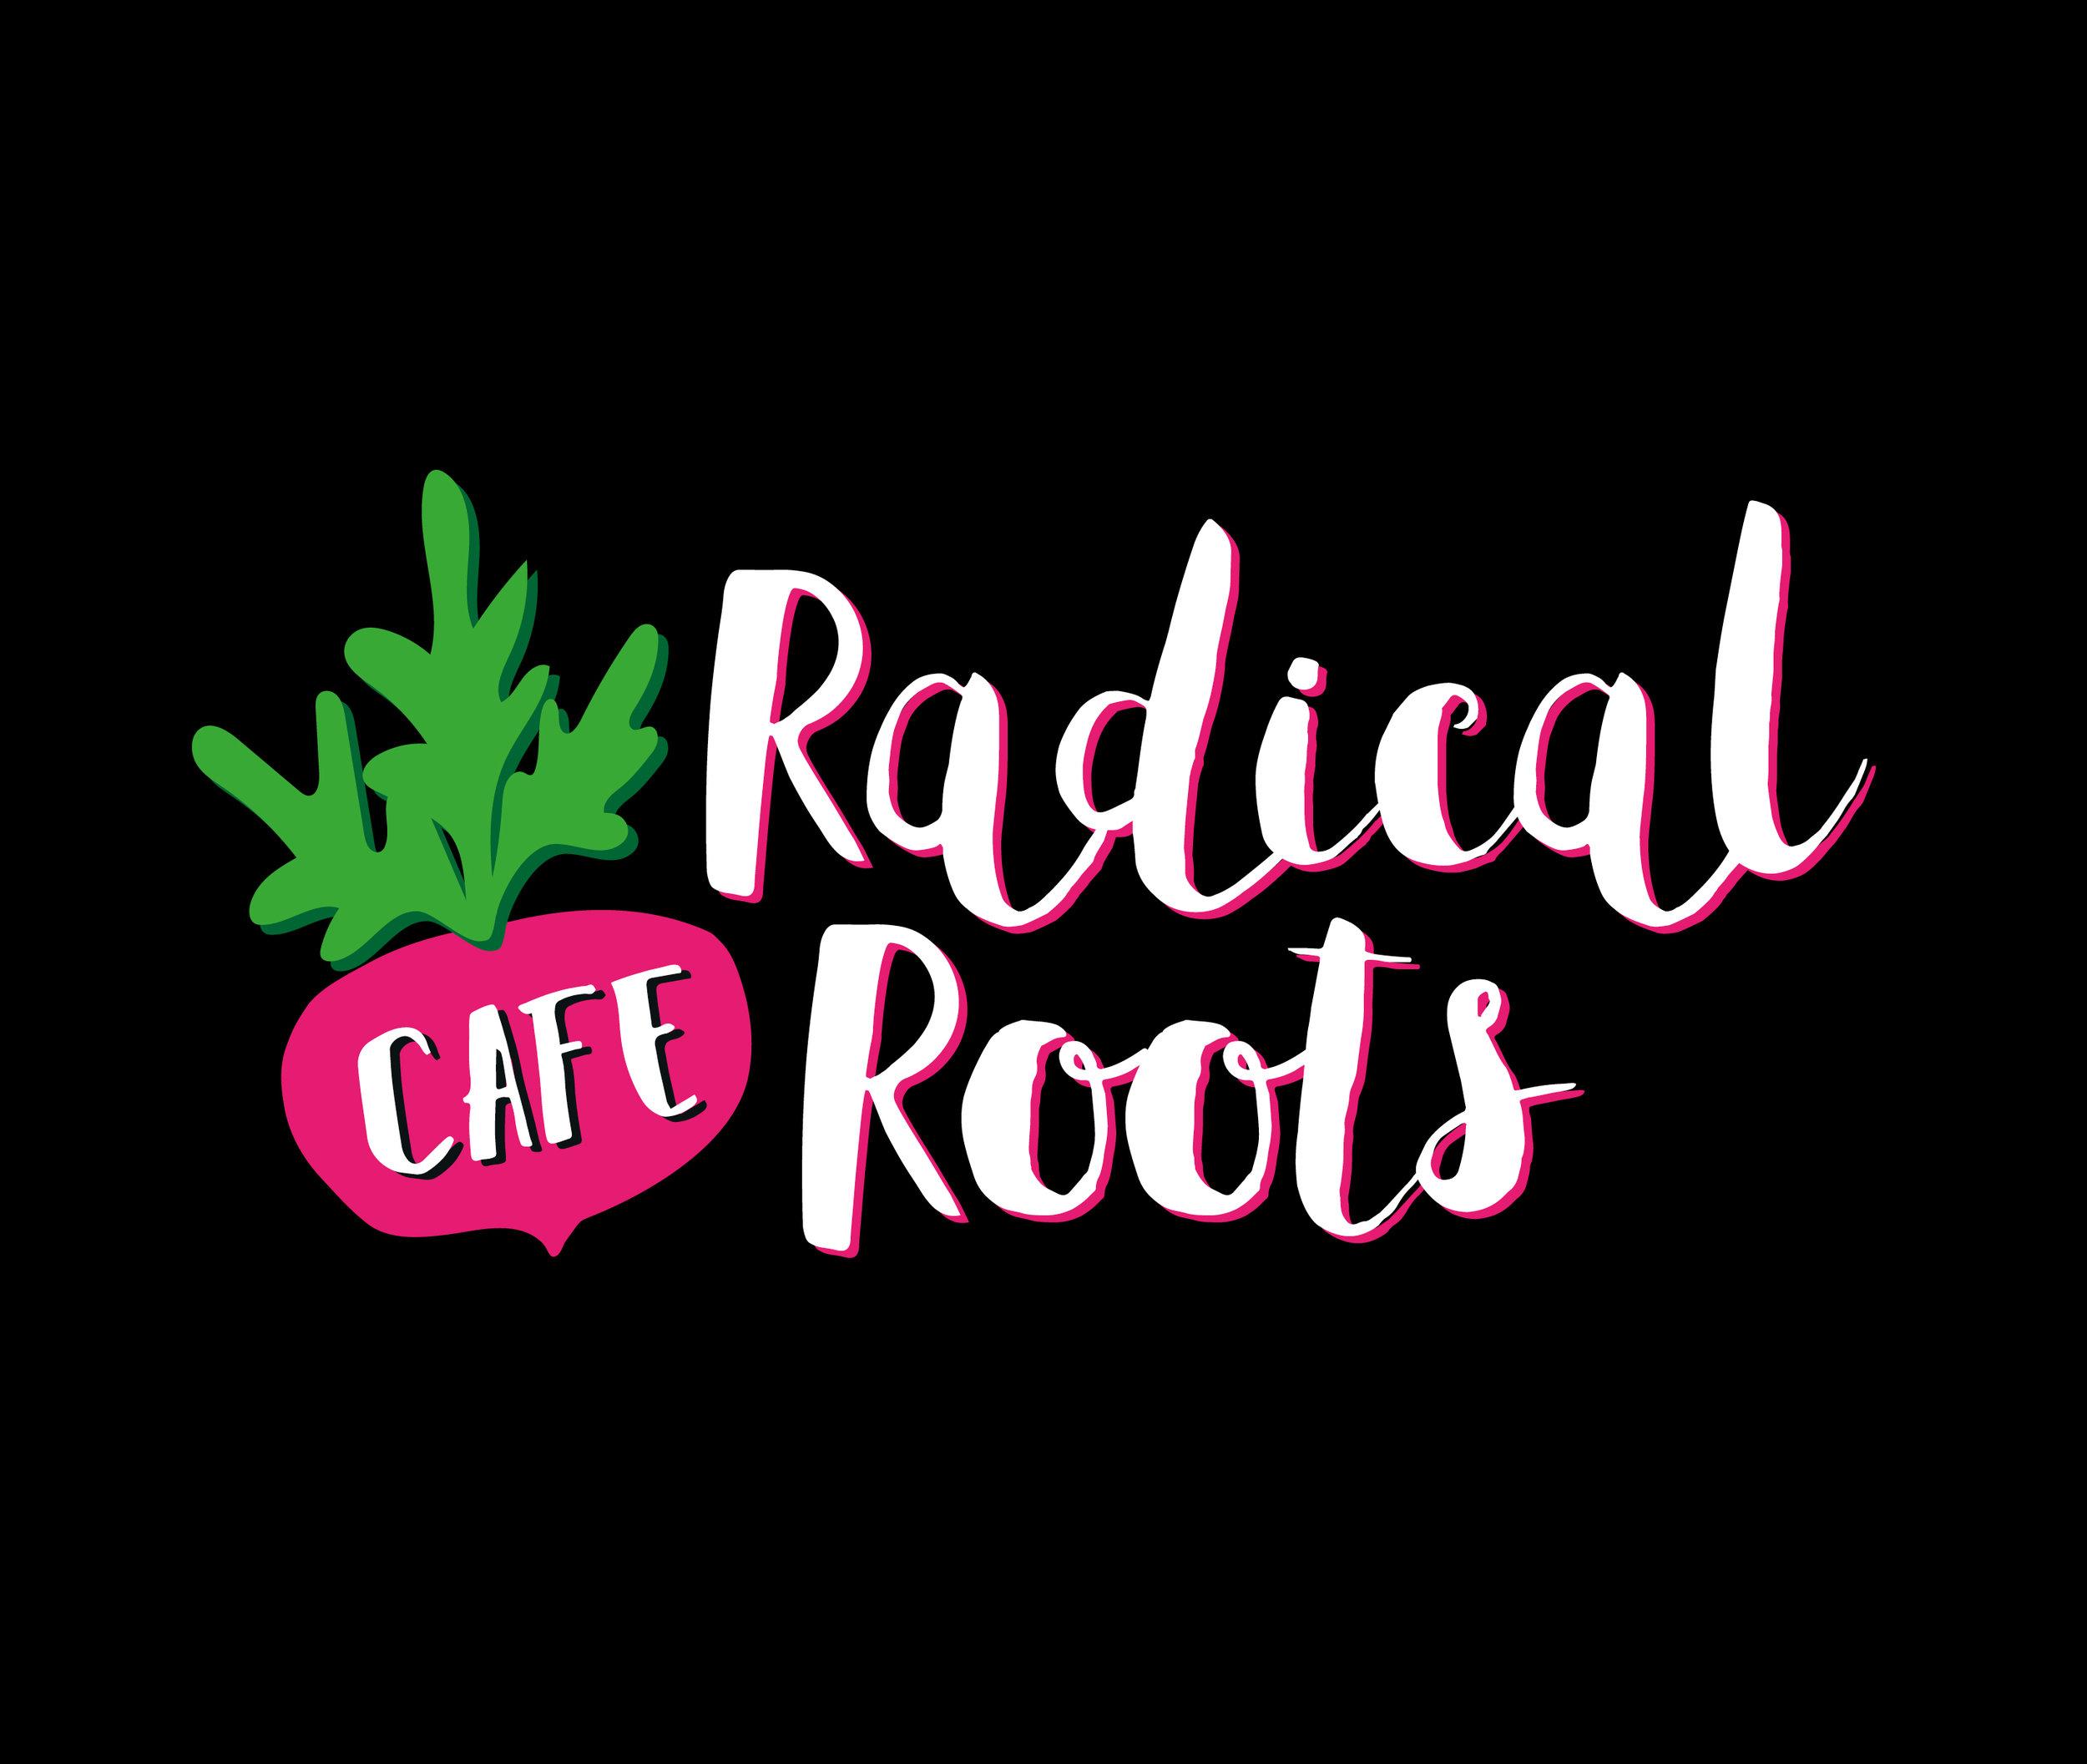 Radical Roots Cafe - Logo design and branding, including illustrated radish